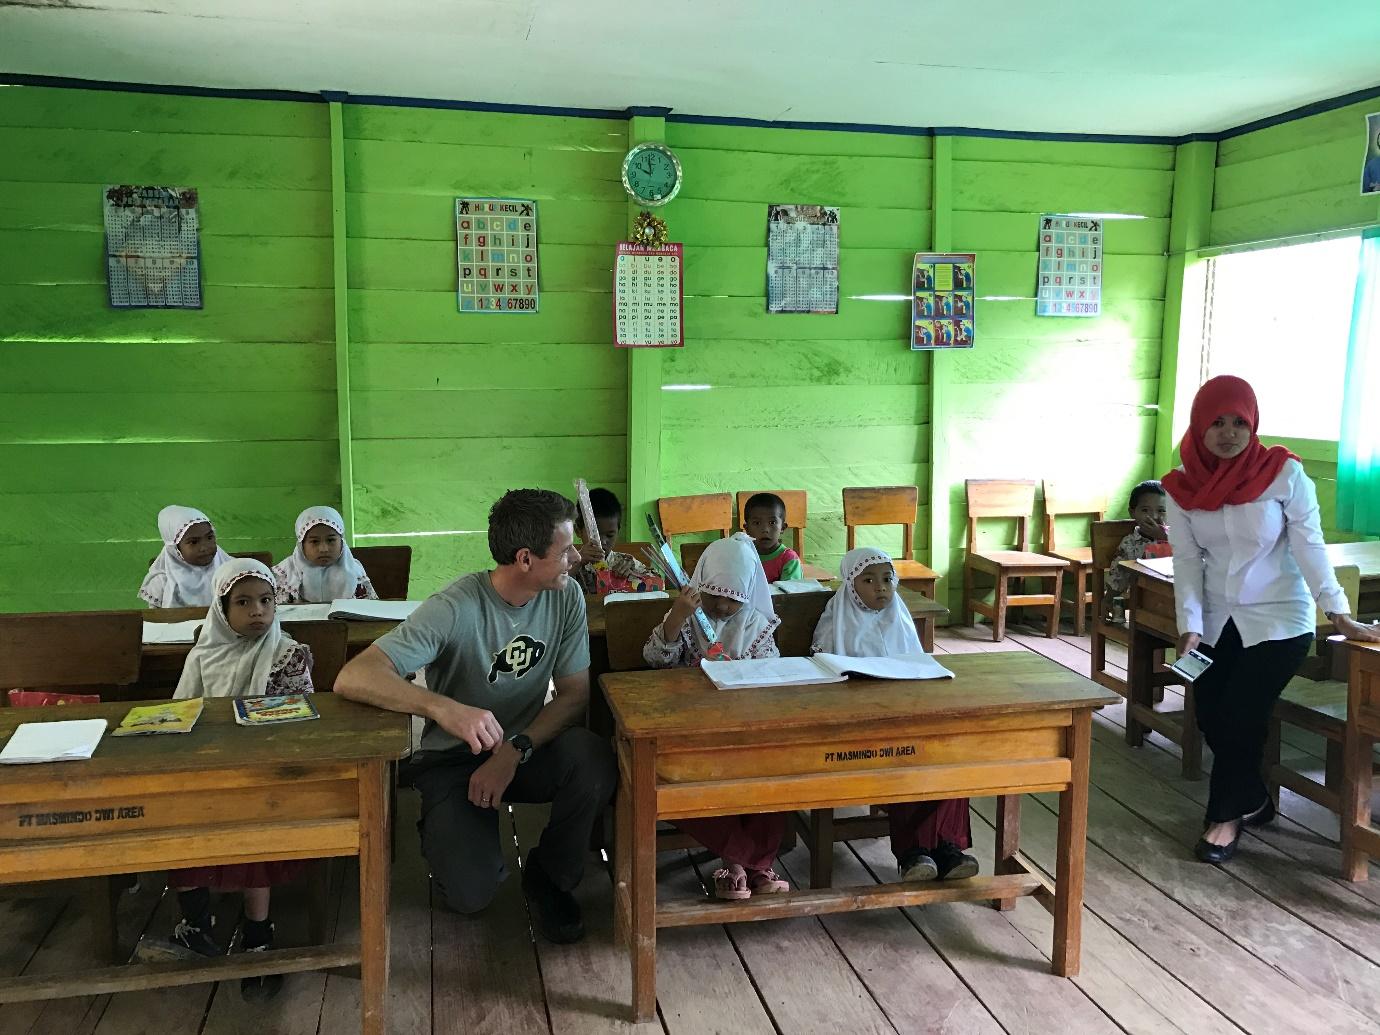 Nusantara CFO Craig Smyth talking to children at school